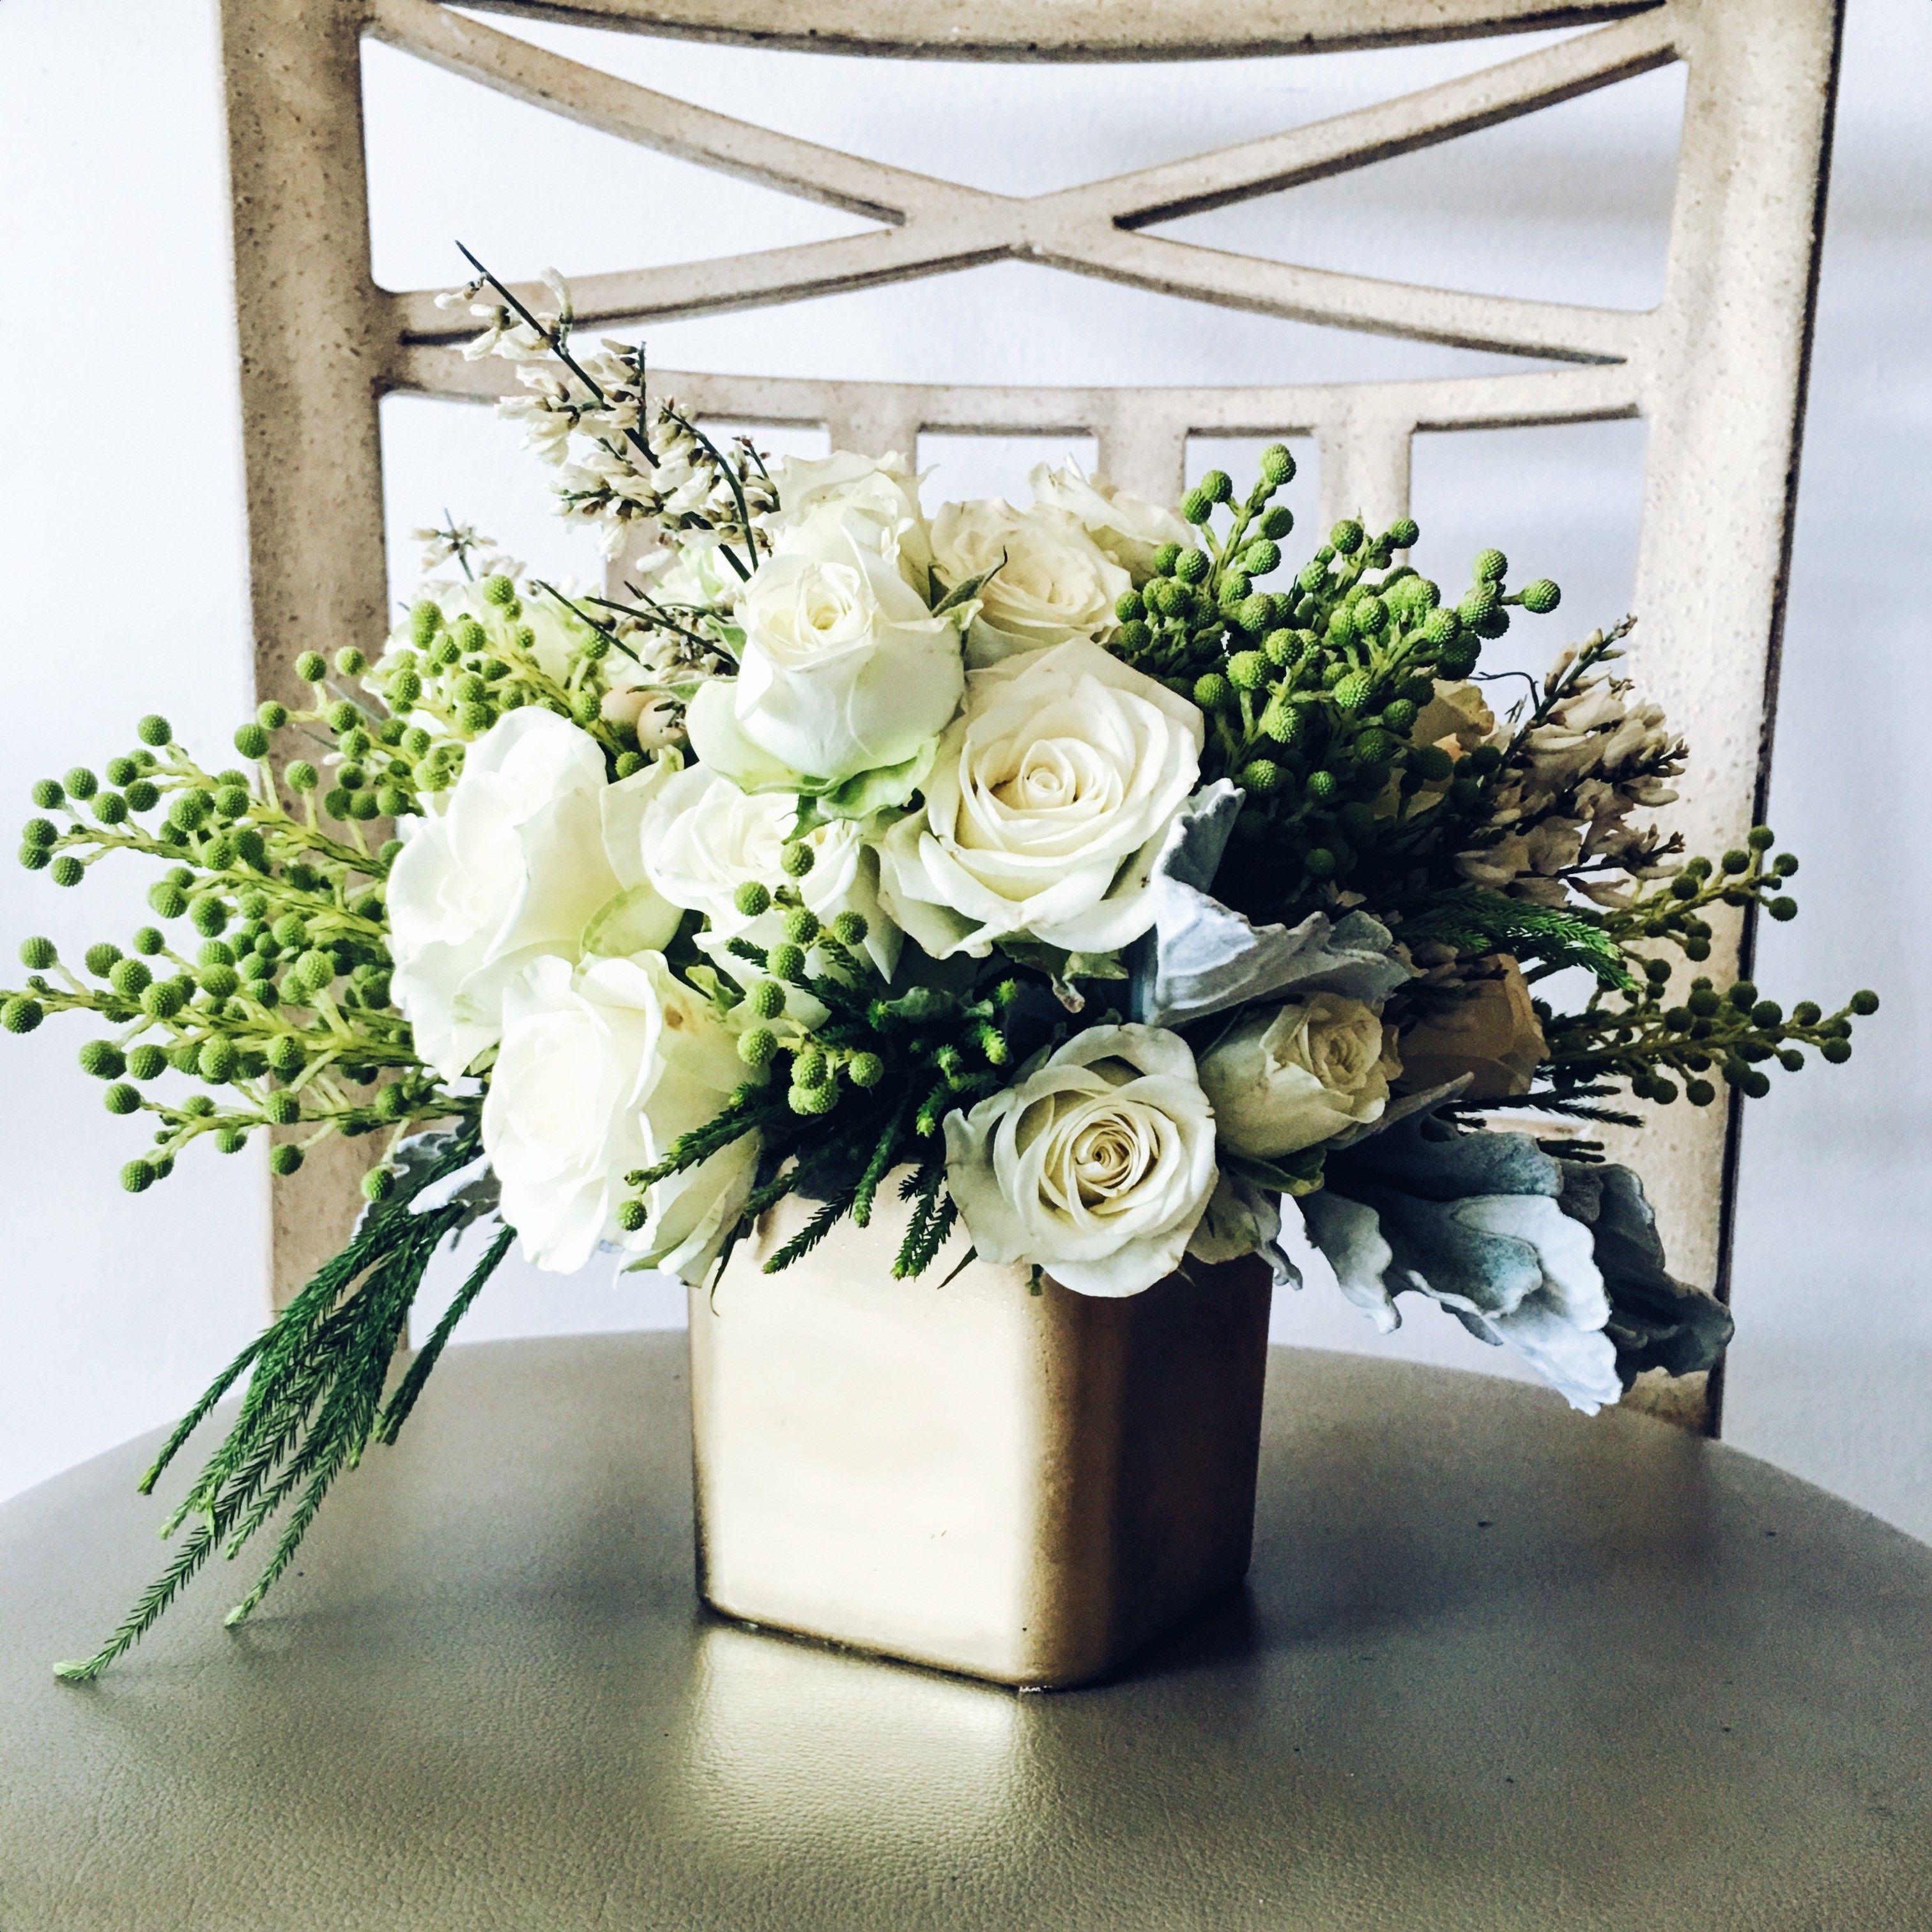 White roses dusty miller greens wedding centerpiece gold vase white roses dusty miller greens wedding centerpiece gold vase laflorist los izmirmasajfo